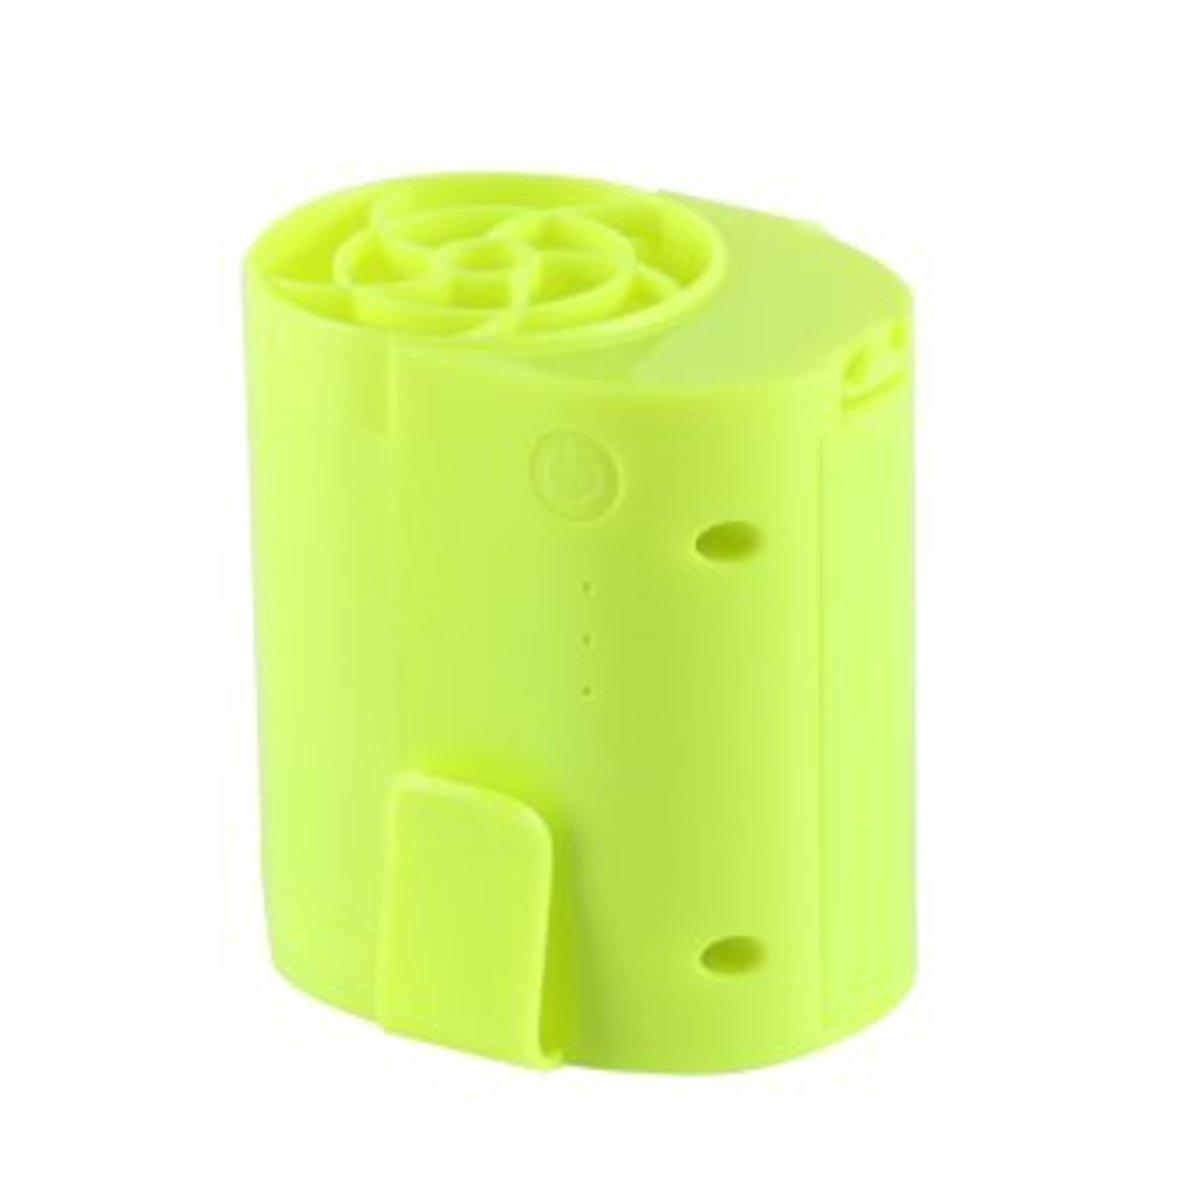 Gongtian Portable Multifunctional Fan 共田掛腰式充電風扇 F12 (green) fa,